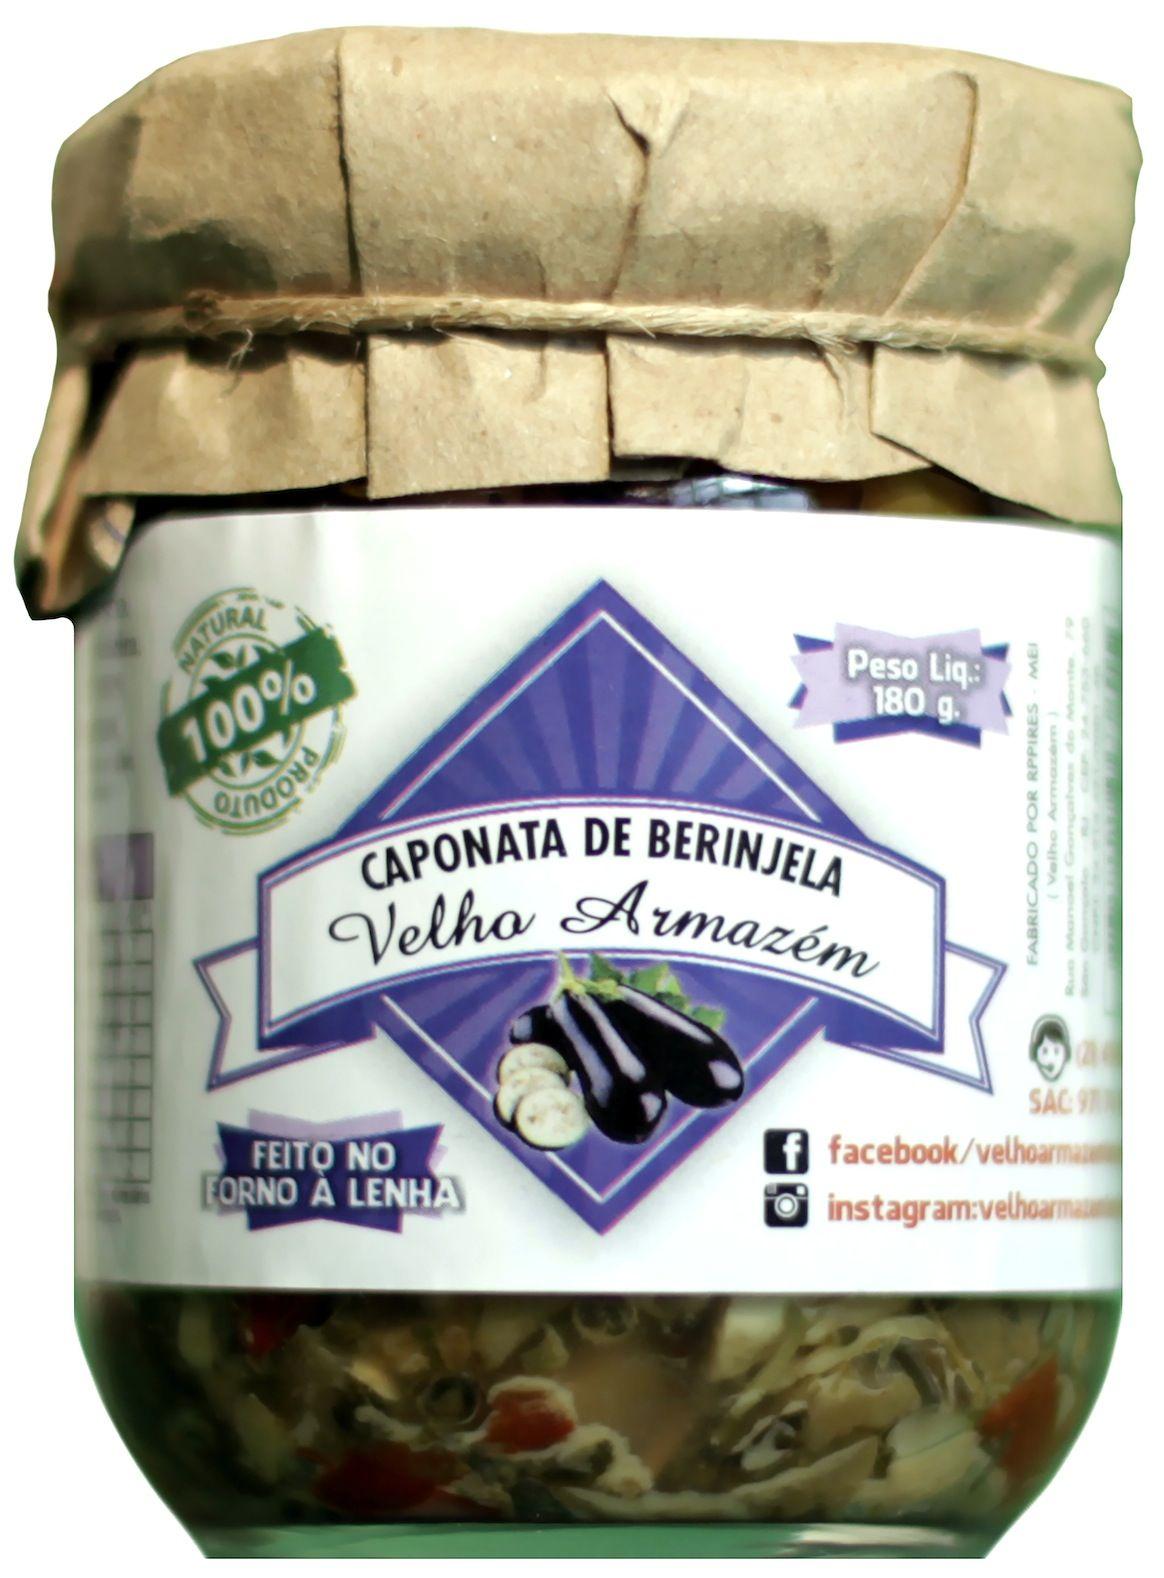 Caponata de berinjela, 180g – Velho Armazém